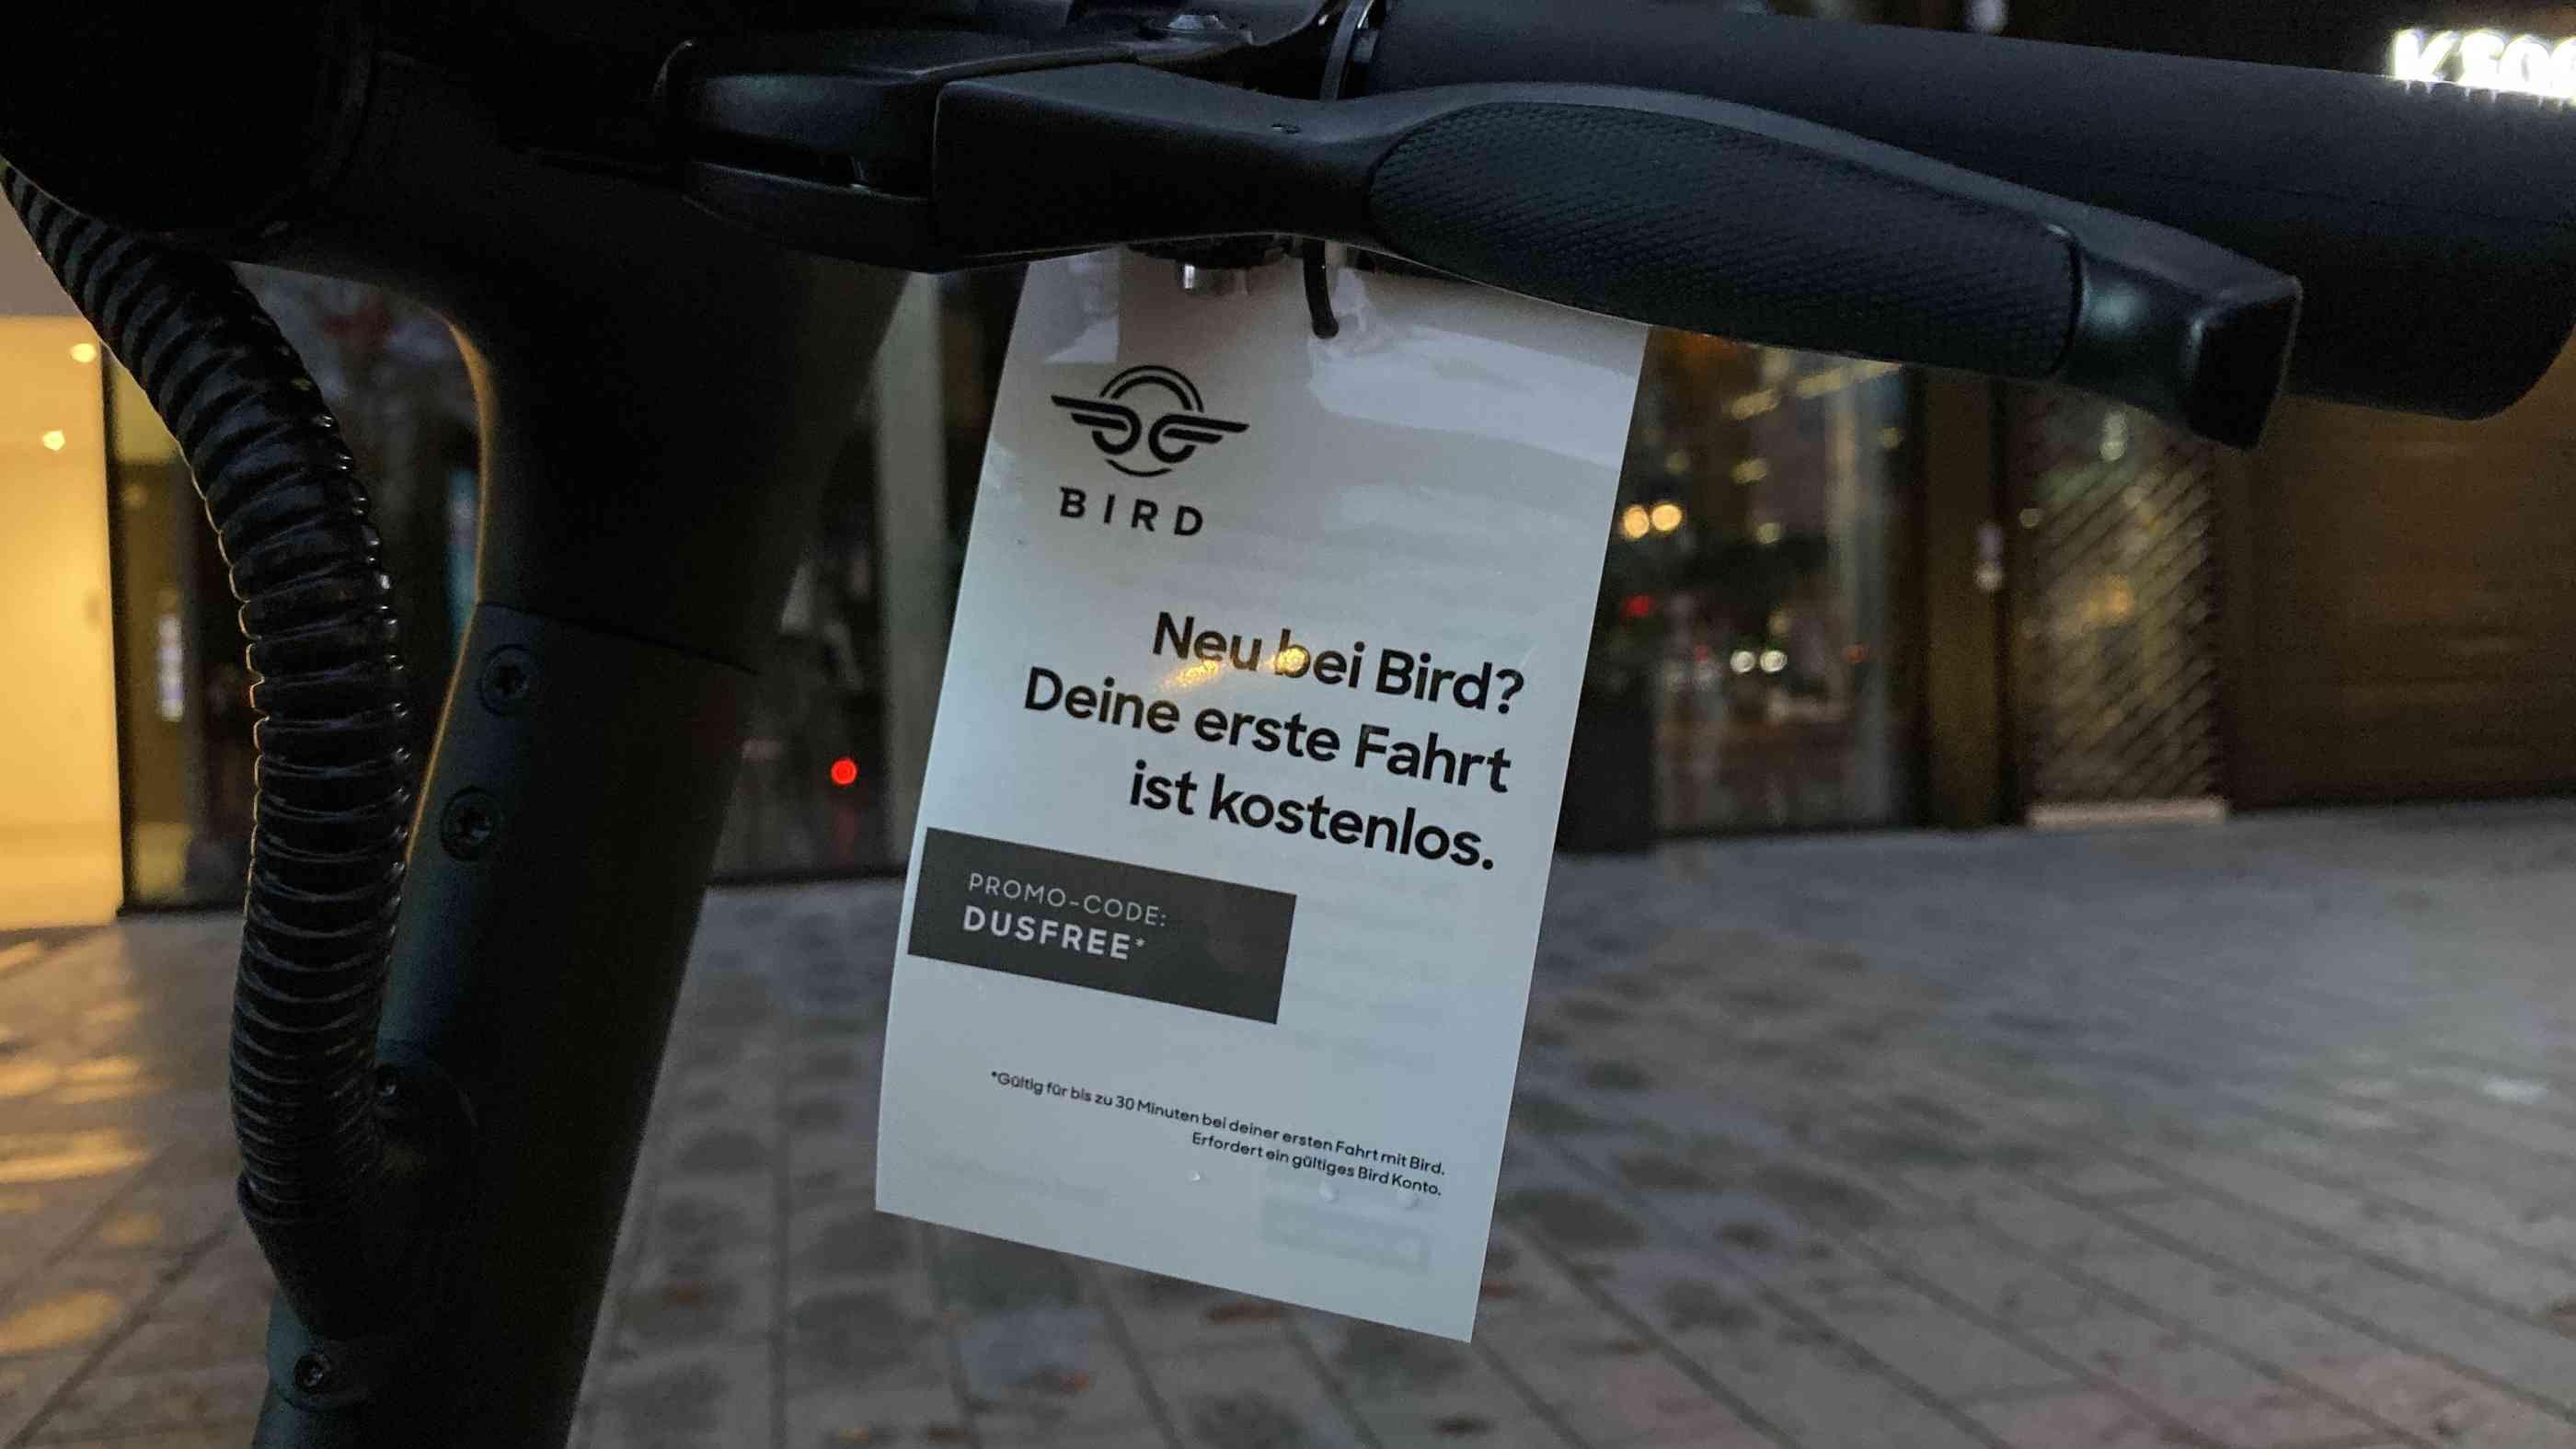 [lokal] Bird e-Scooter Freifahrt für Neukunden (7€ Wert = 30 Minuten)